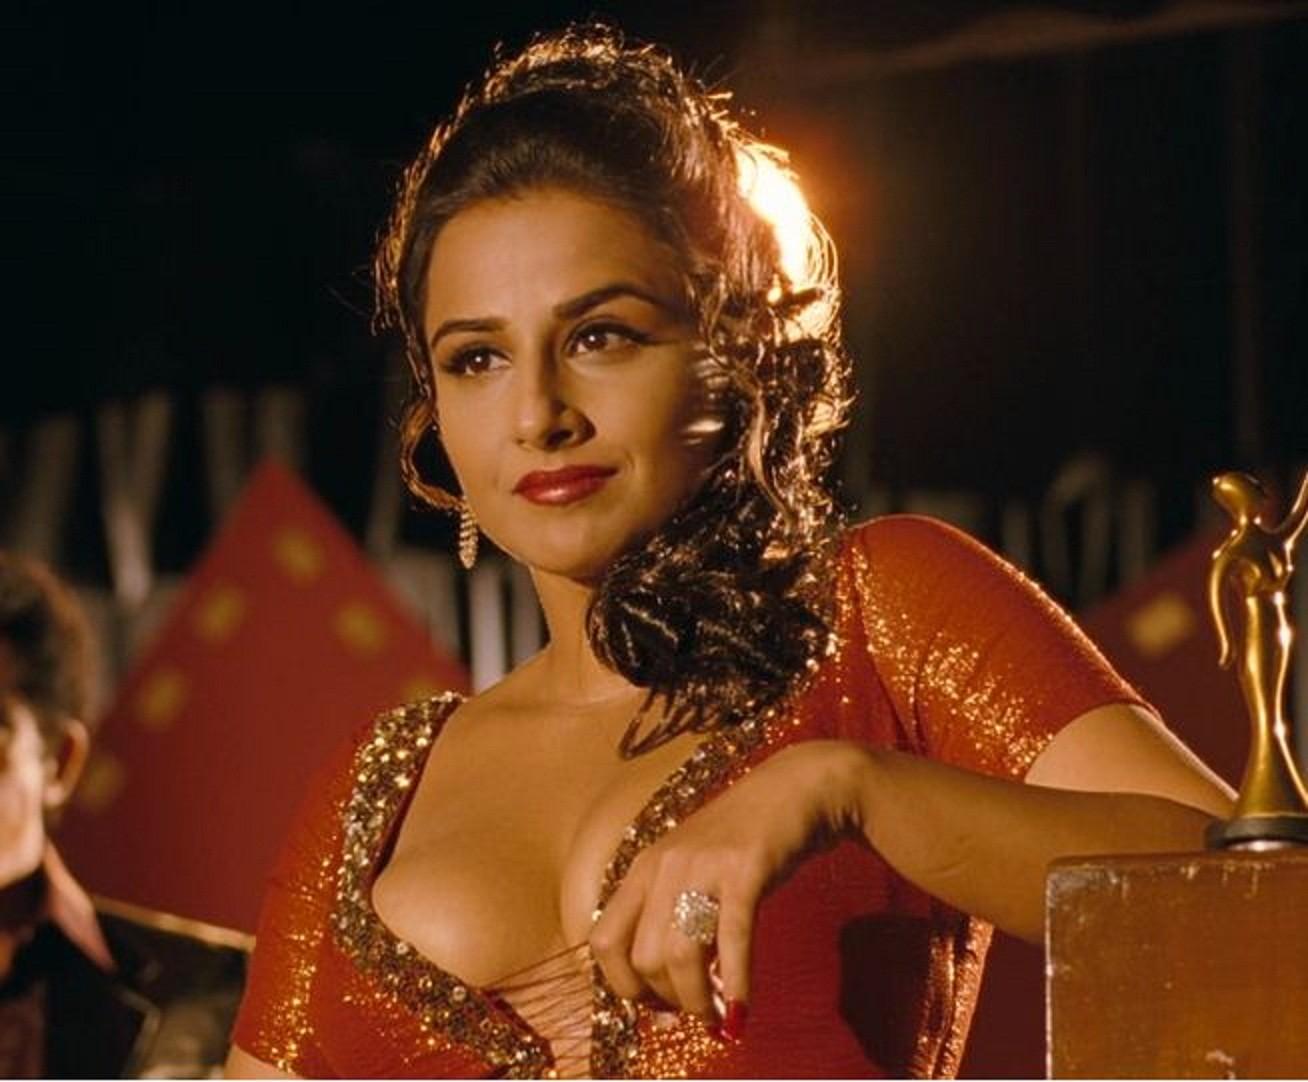 vidya balan bollywood hot actress pictures gallery - indian girls pic